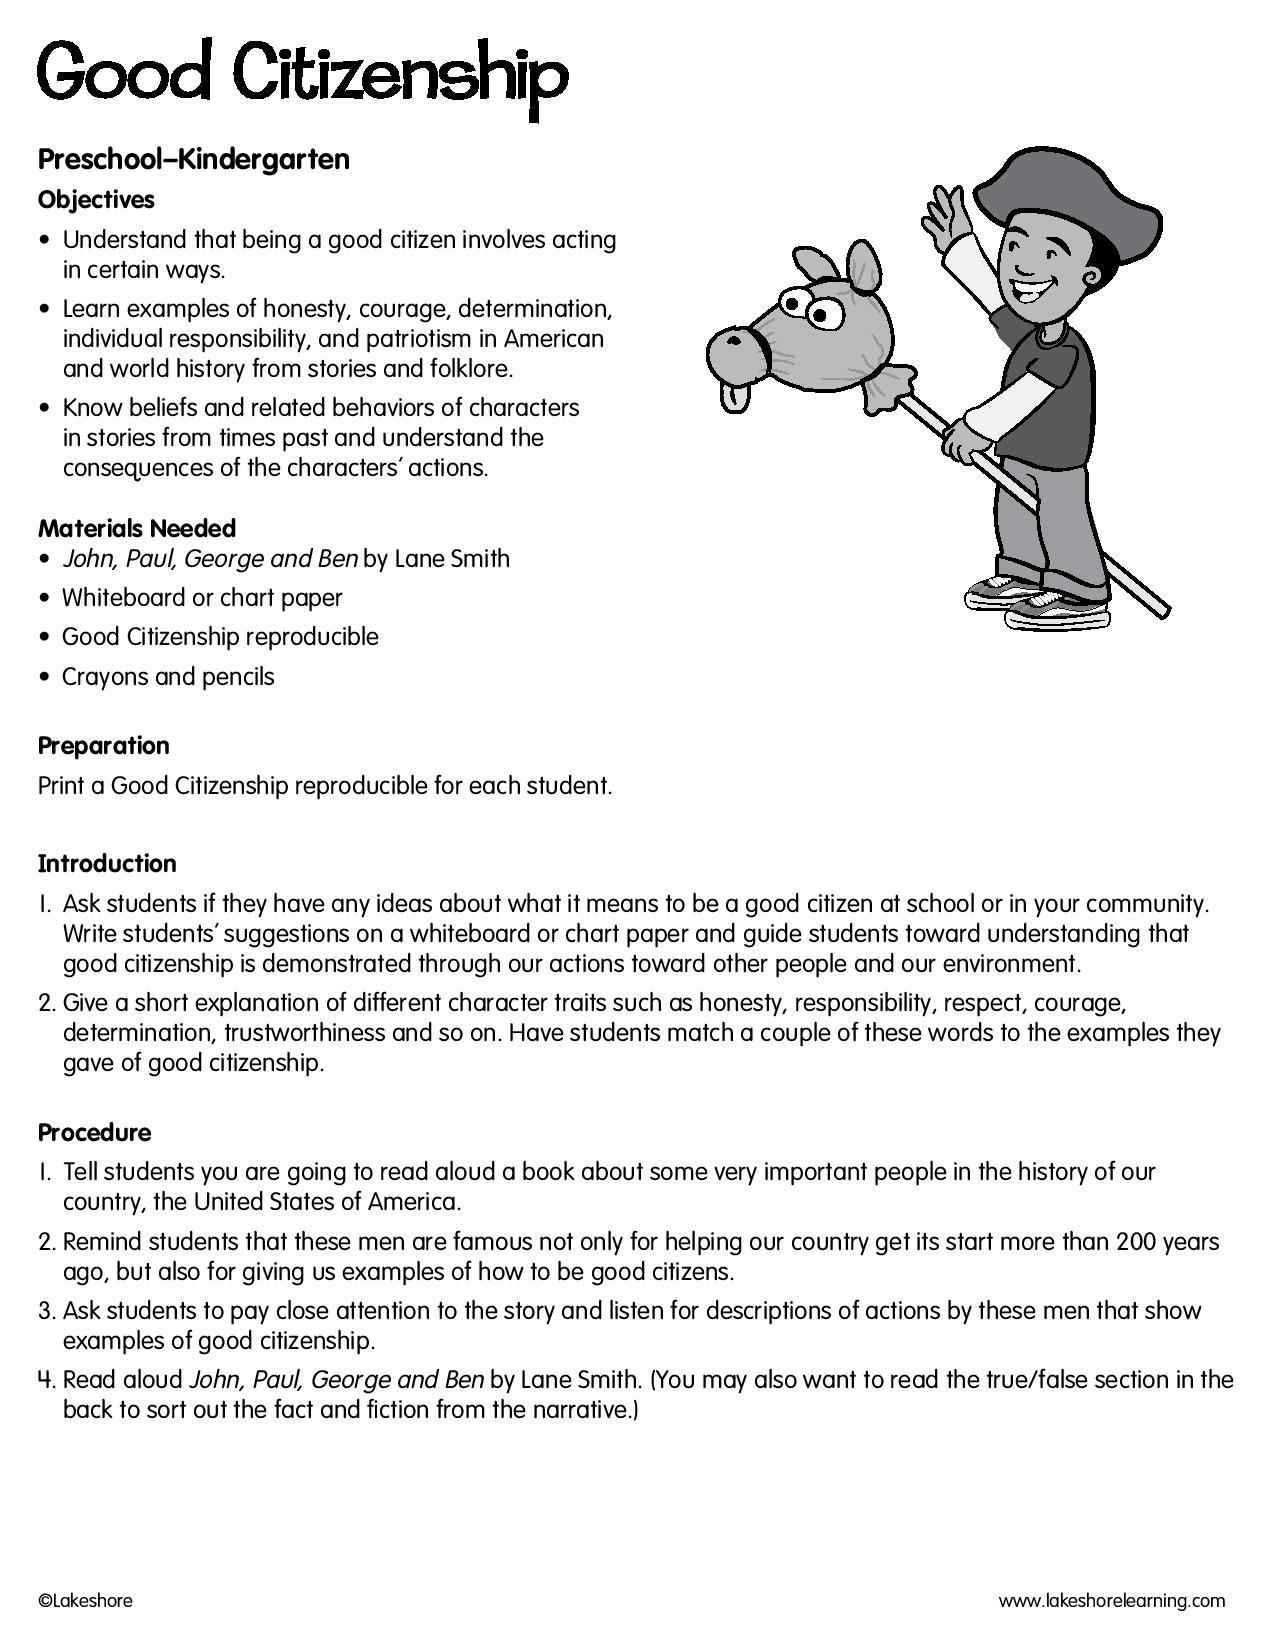 Pin on Lesson Plans \u0026 Worksheets [ 1650 x 1275 Pixel ]